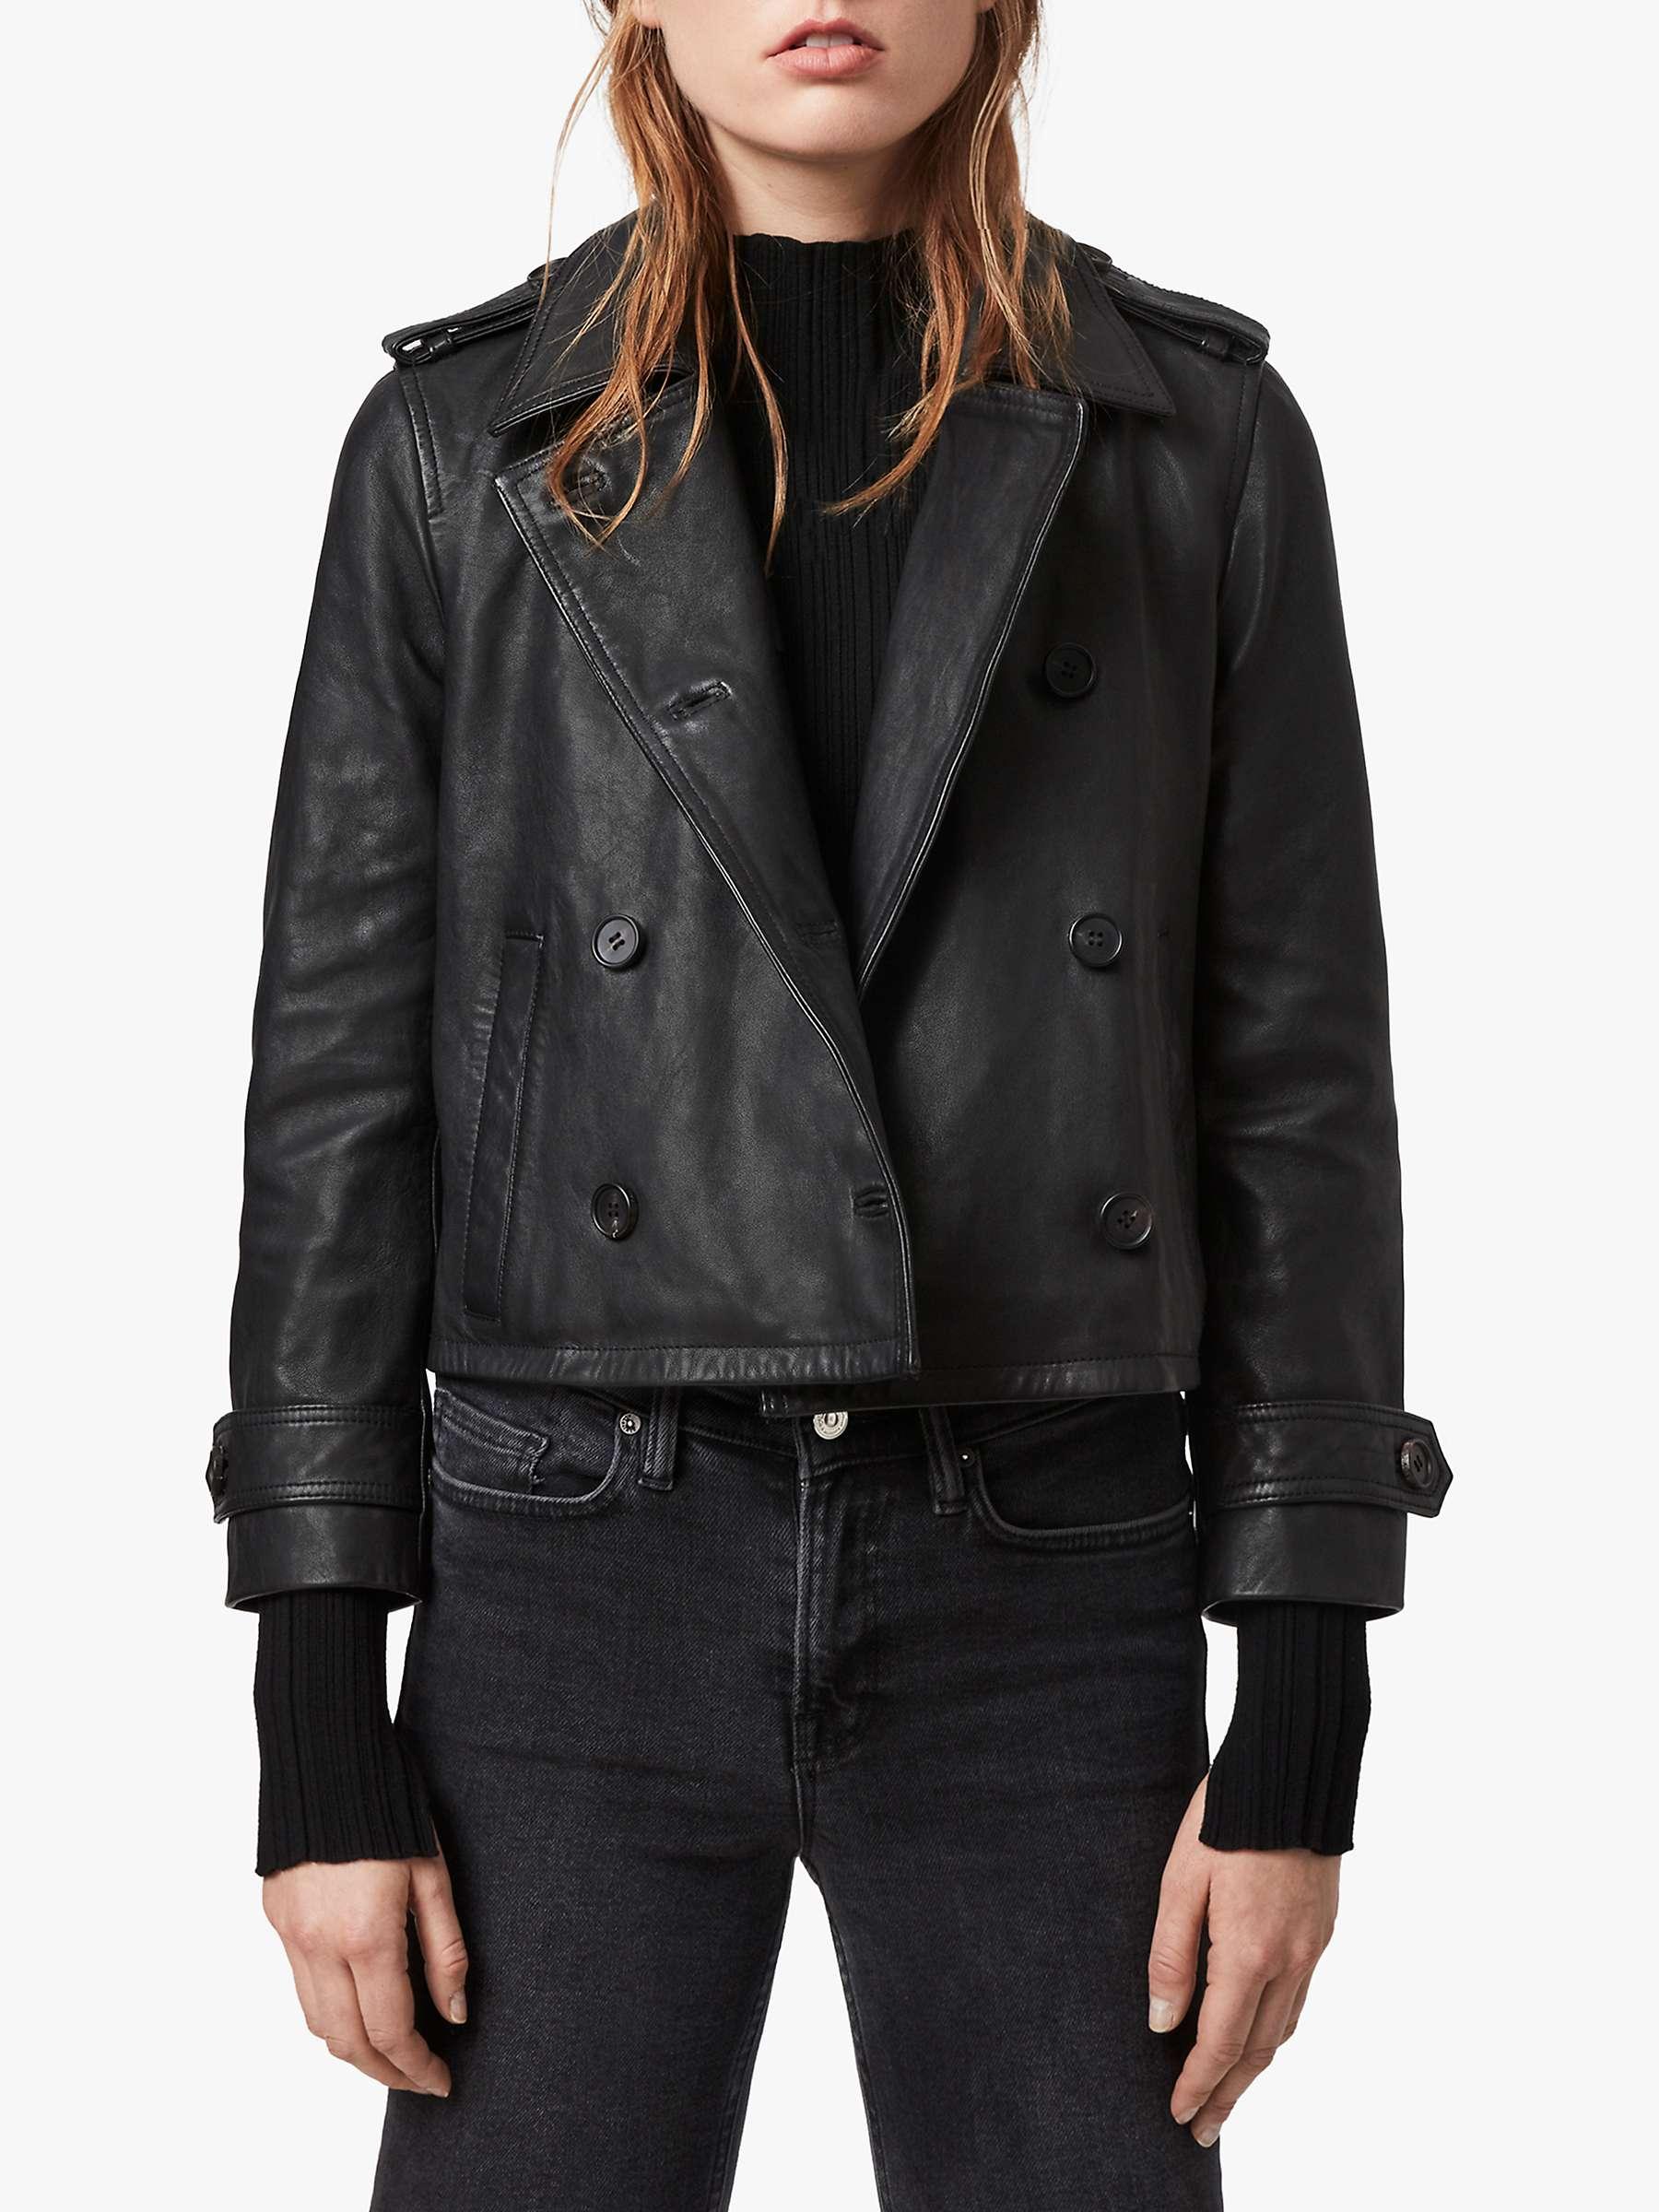 All Saints Trae Leather Jacket, Black by John Lewis